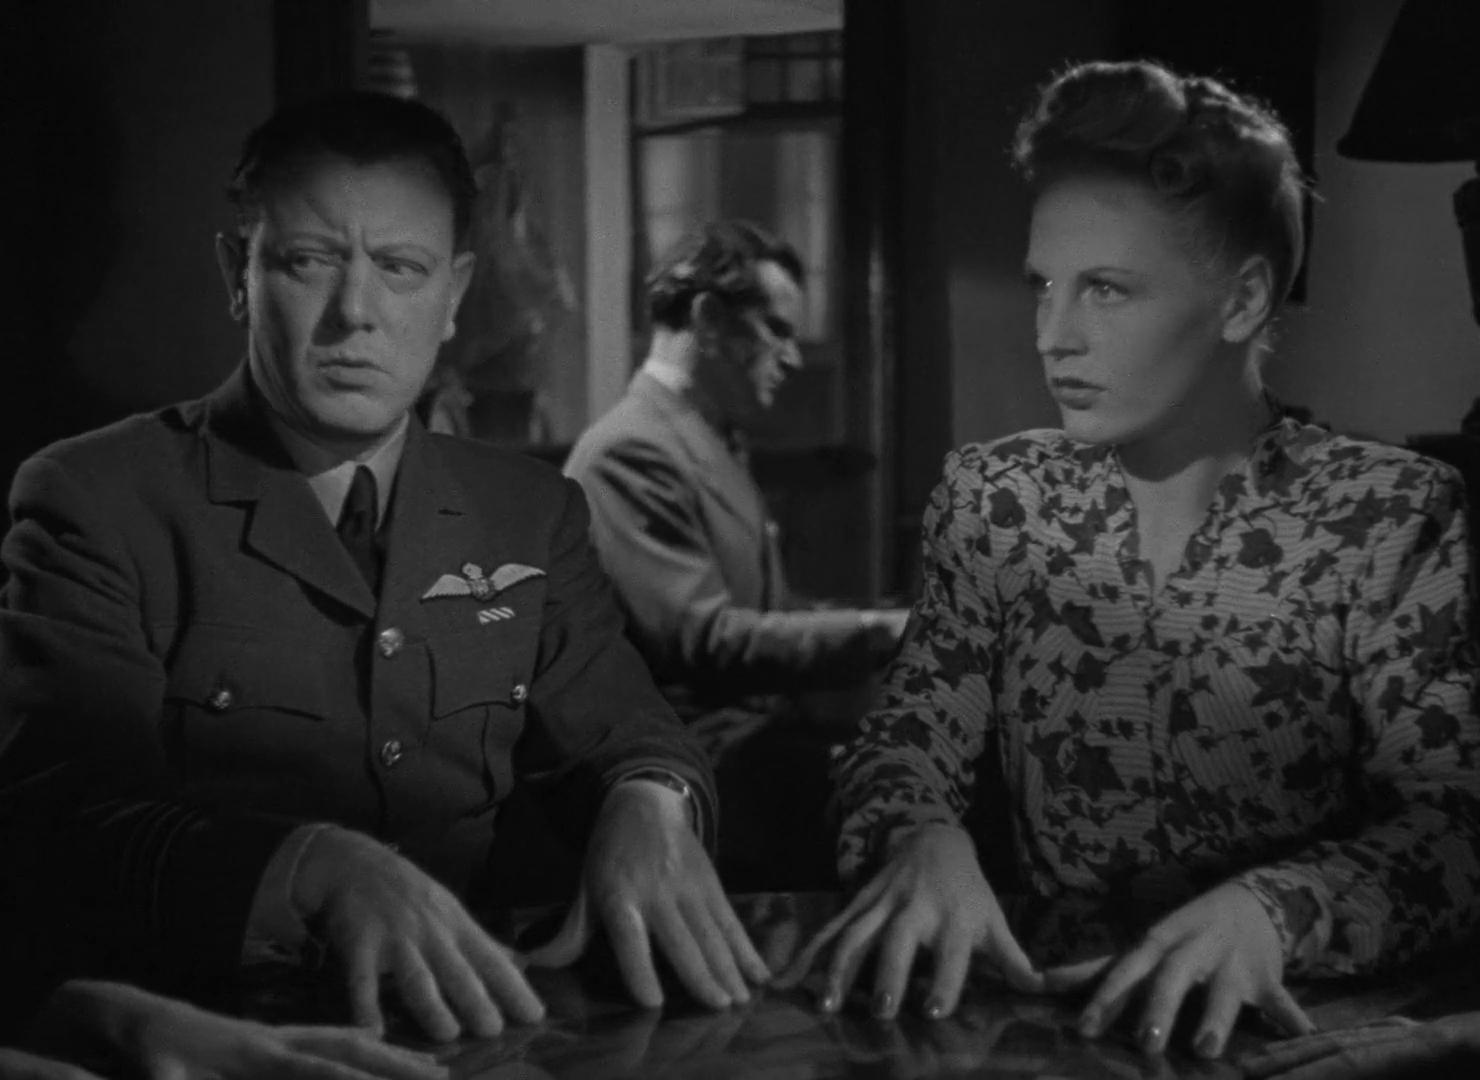 Richard Bird, Esmond Knight et Valerie White dans The halfway house (L'auberge fantôme, 1944) de Basil Dearden